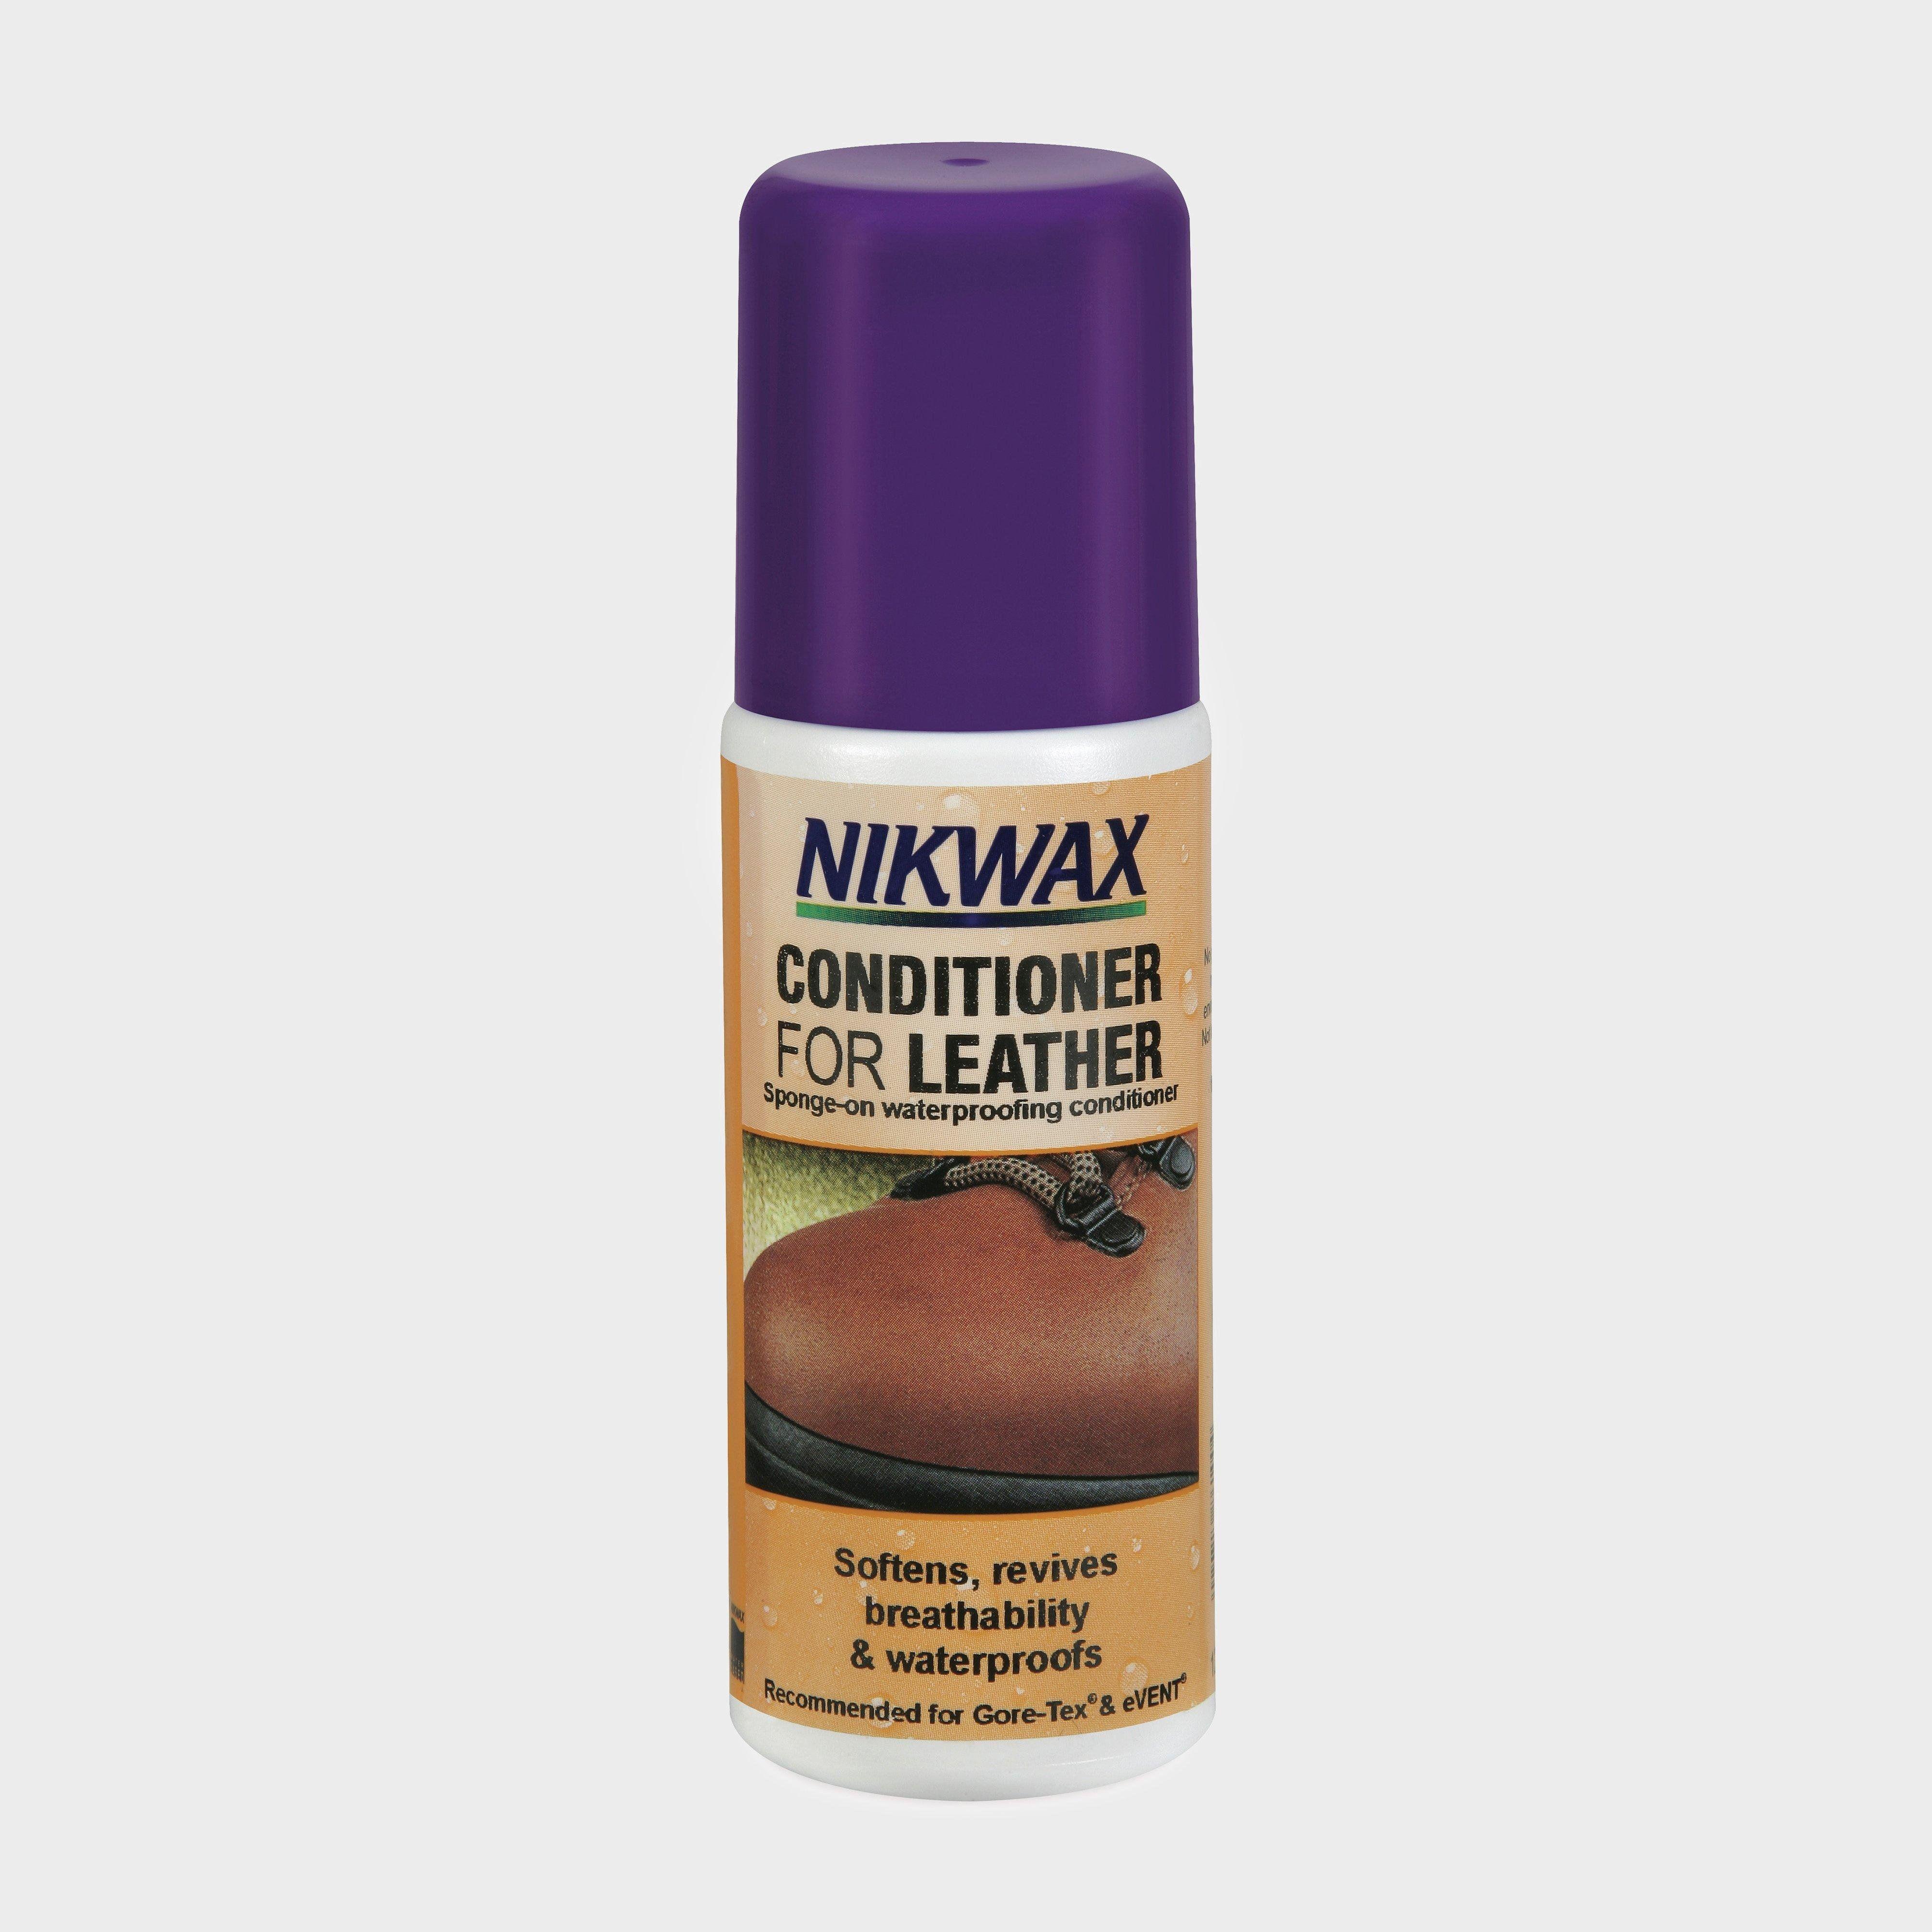 NIKWAX Liquid Conditioner & Proofer